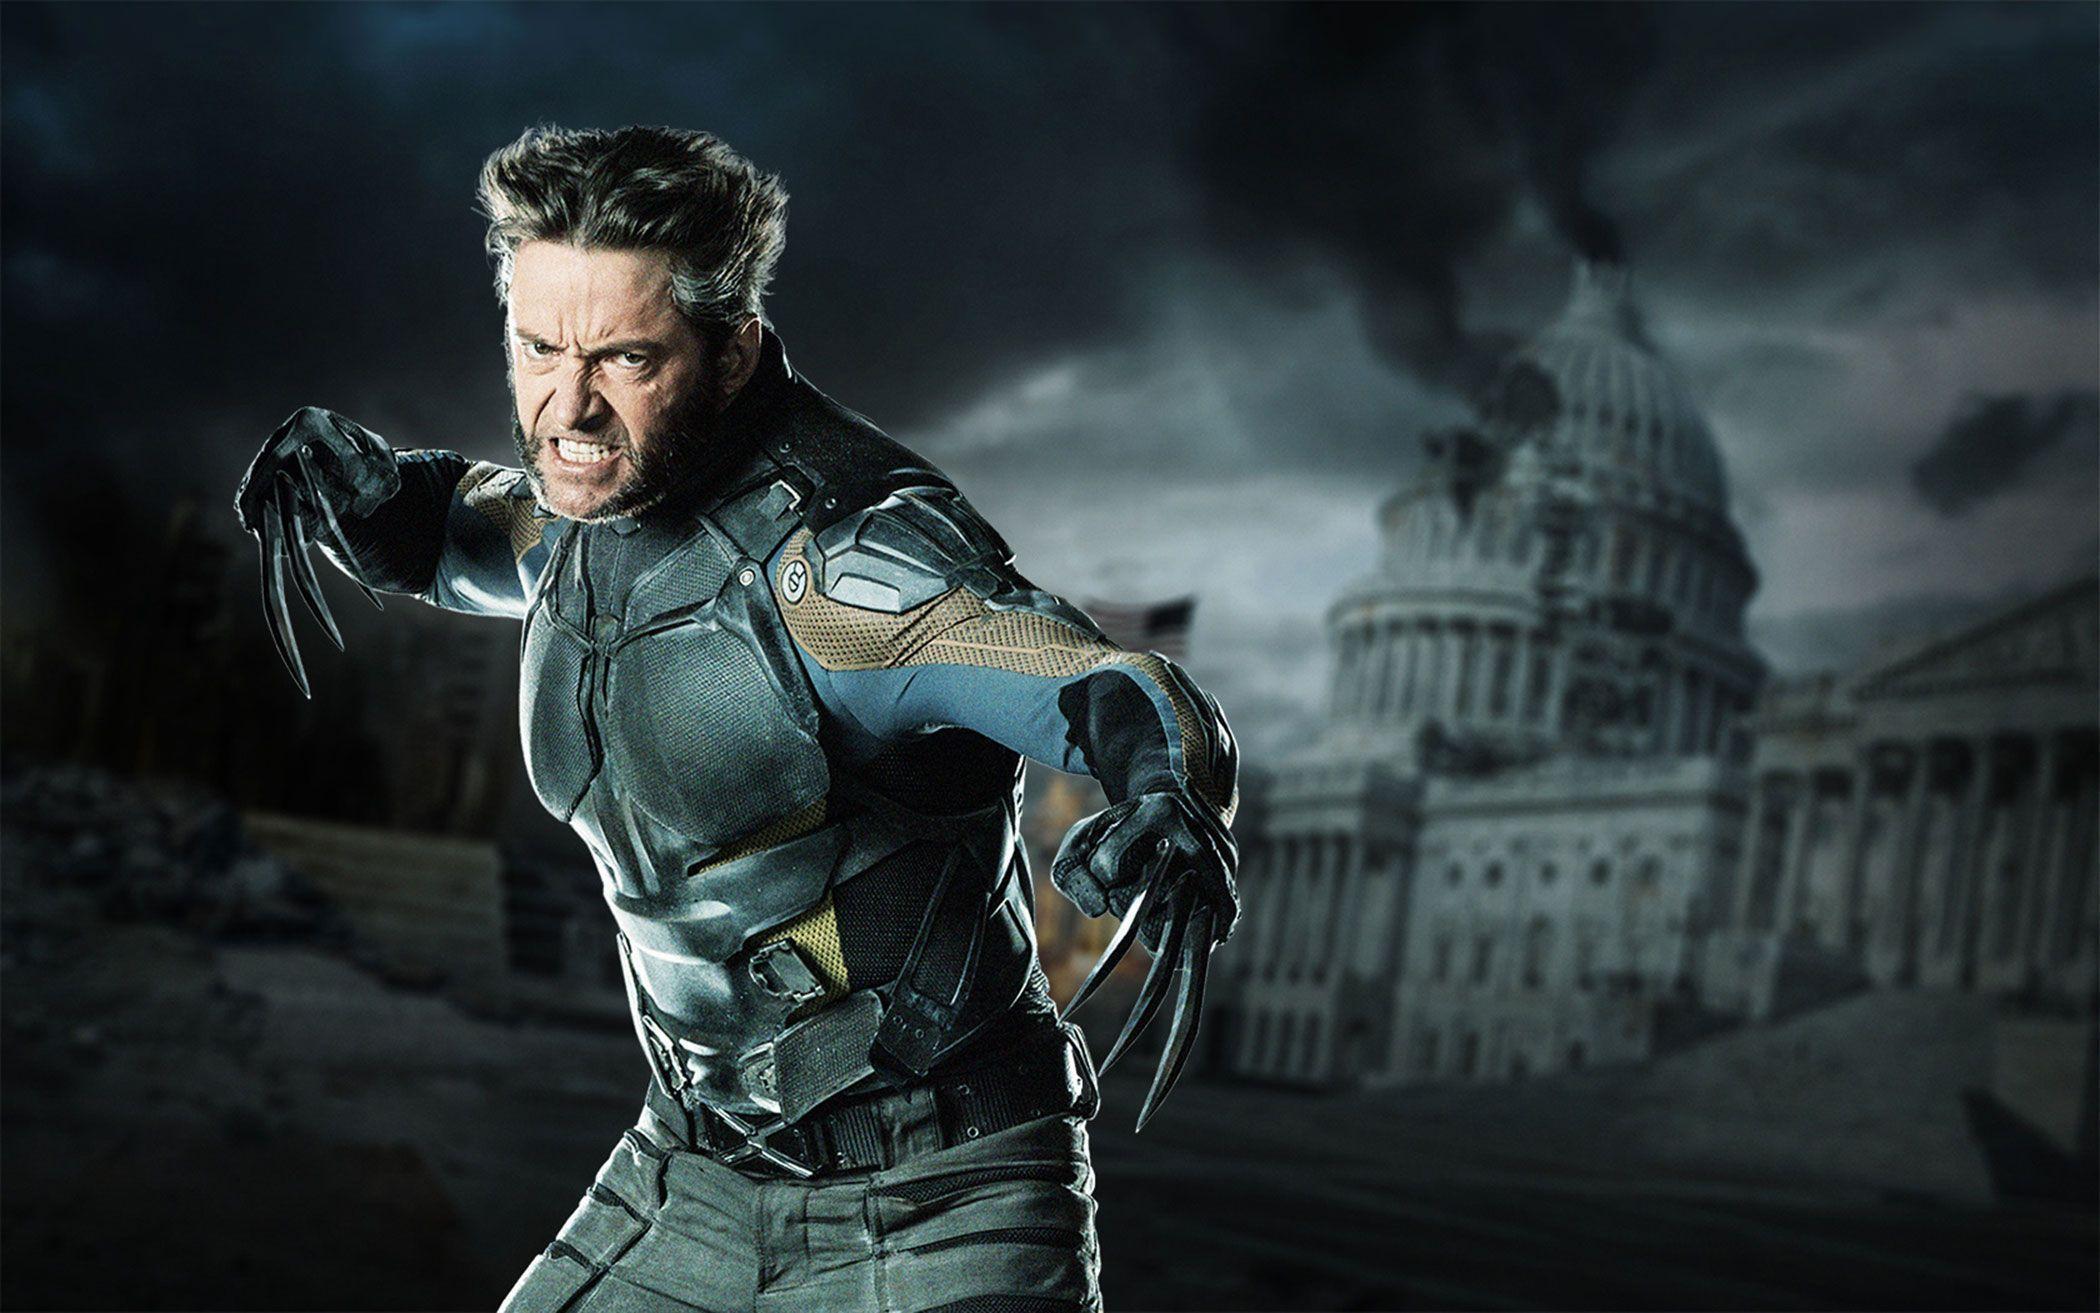 Hugh Jackman Wallpapers Hd: X-Men Wolverine 2015 Wallpapers